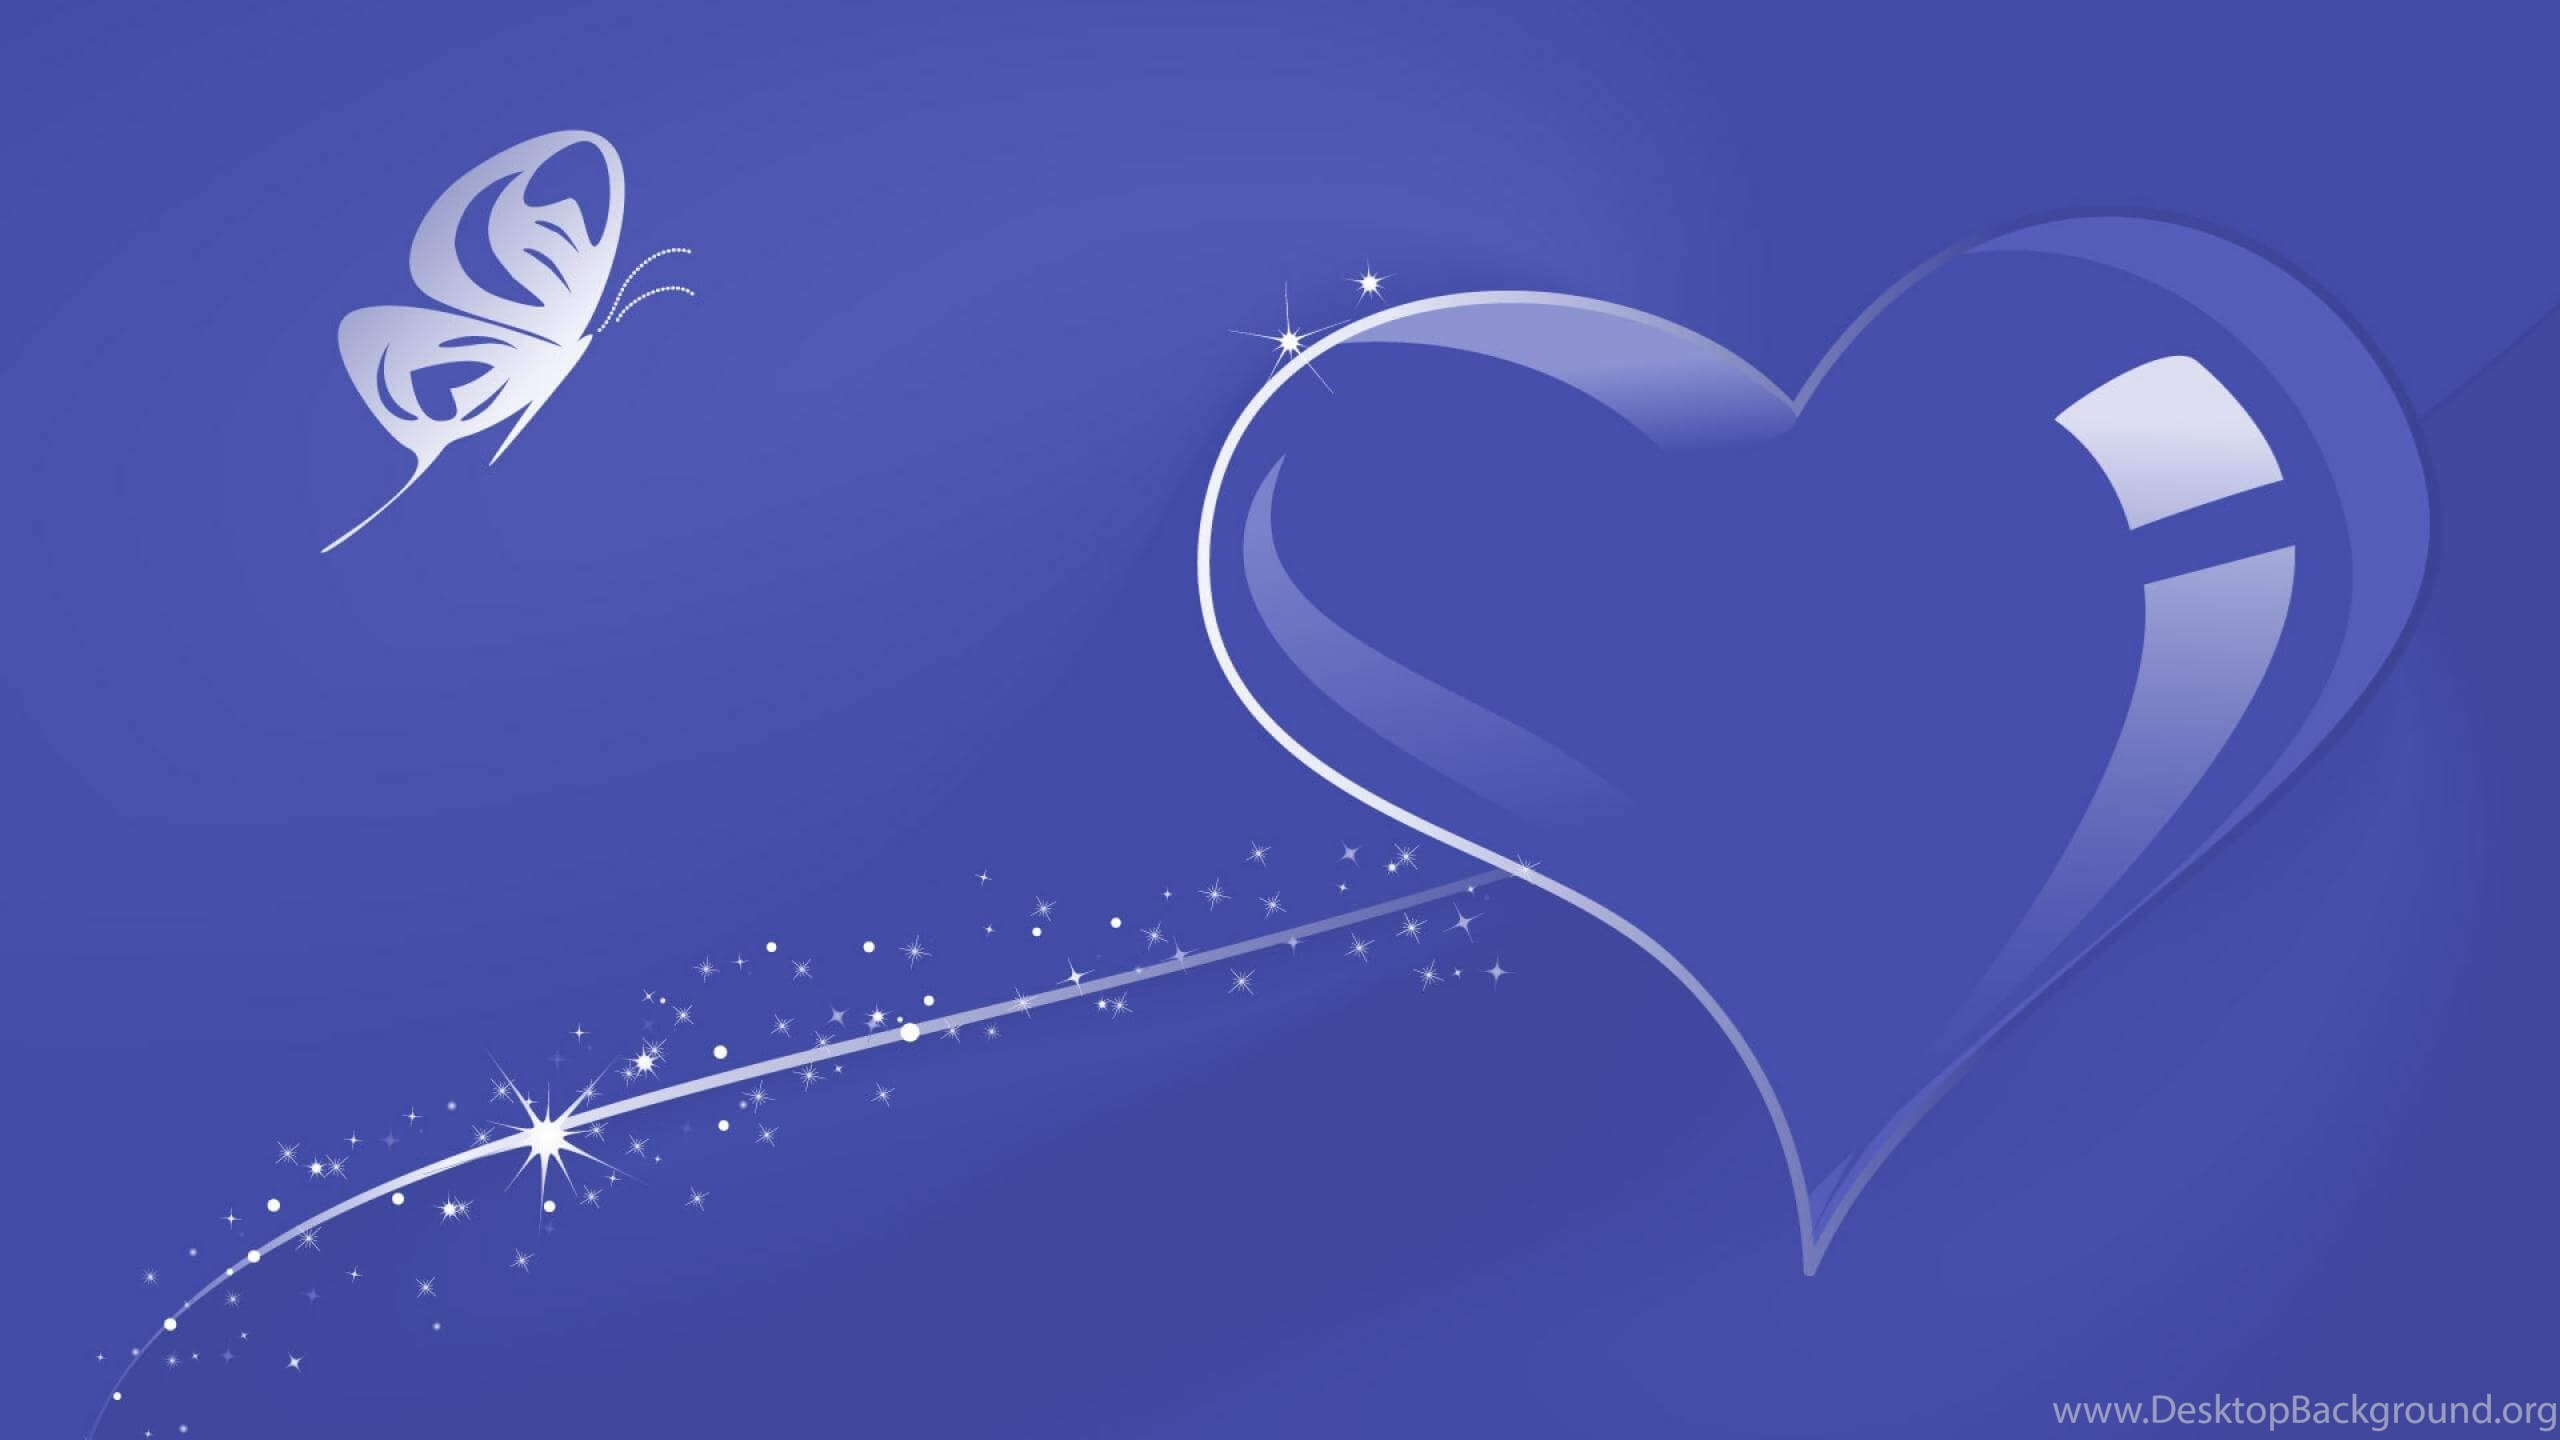 love heart wallpapers for desktop, free download hd wallpapers